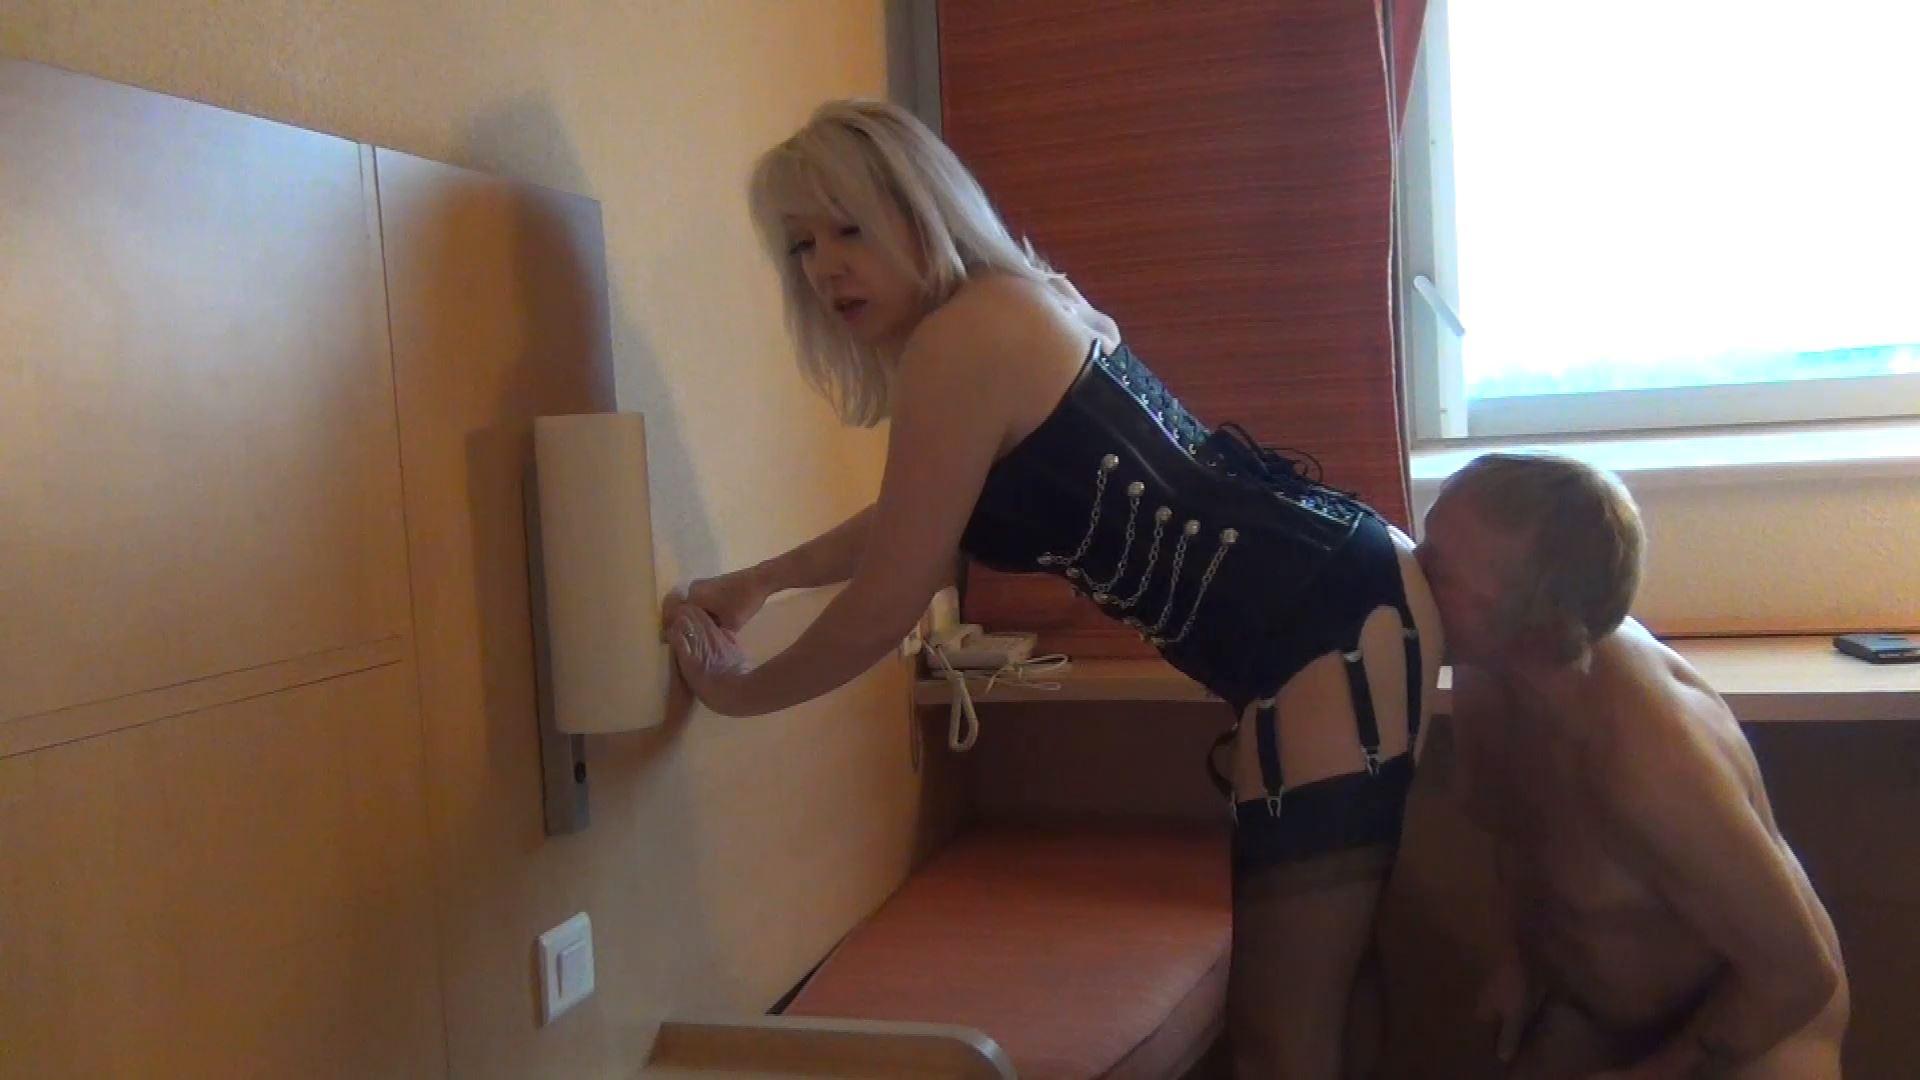 Mistress Zena In Scene: Ass, leg and foot worship - MISTRESSZENA - FULL HD/1080p/MP4